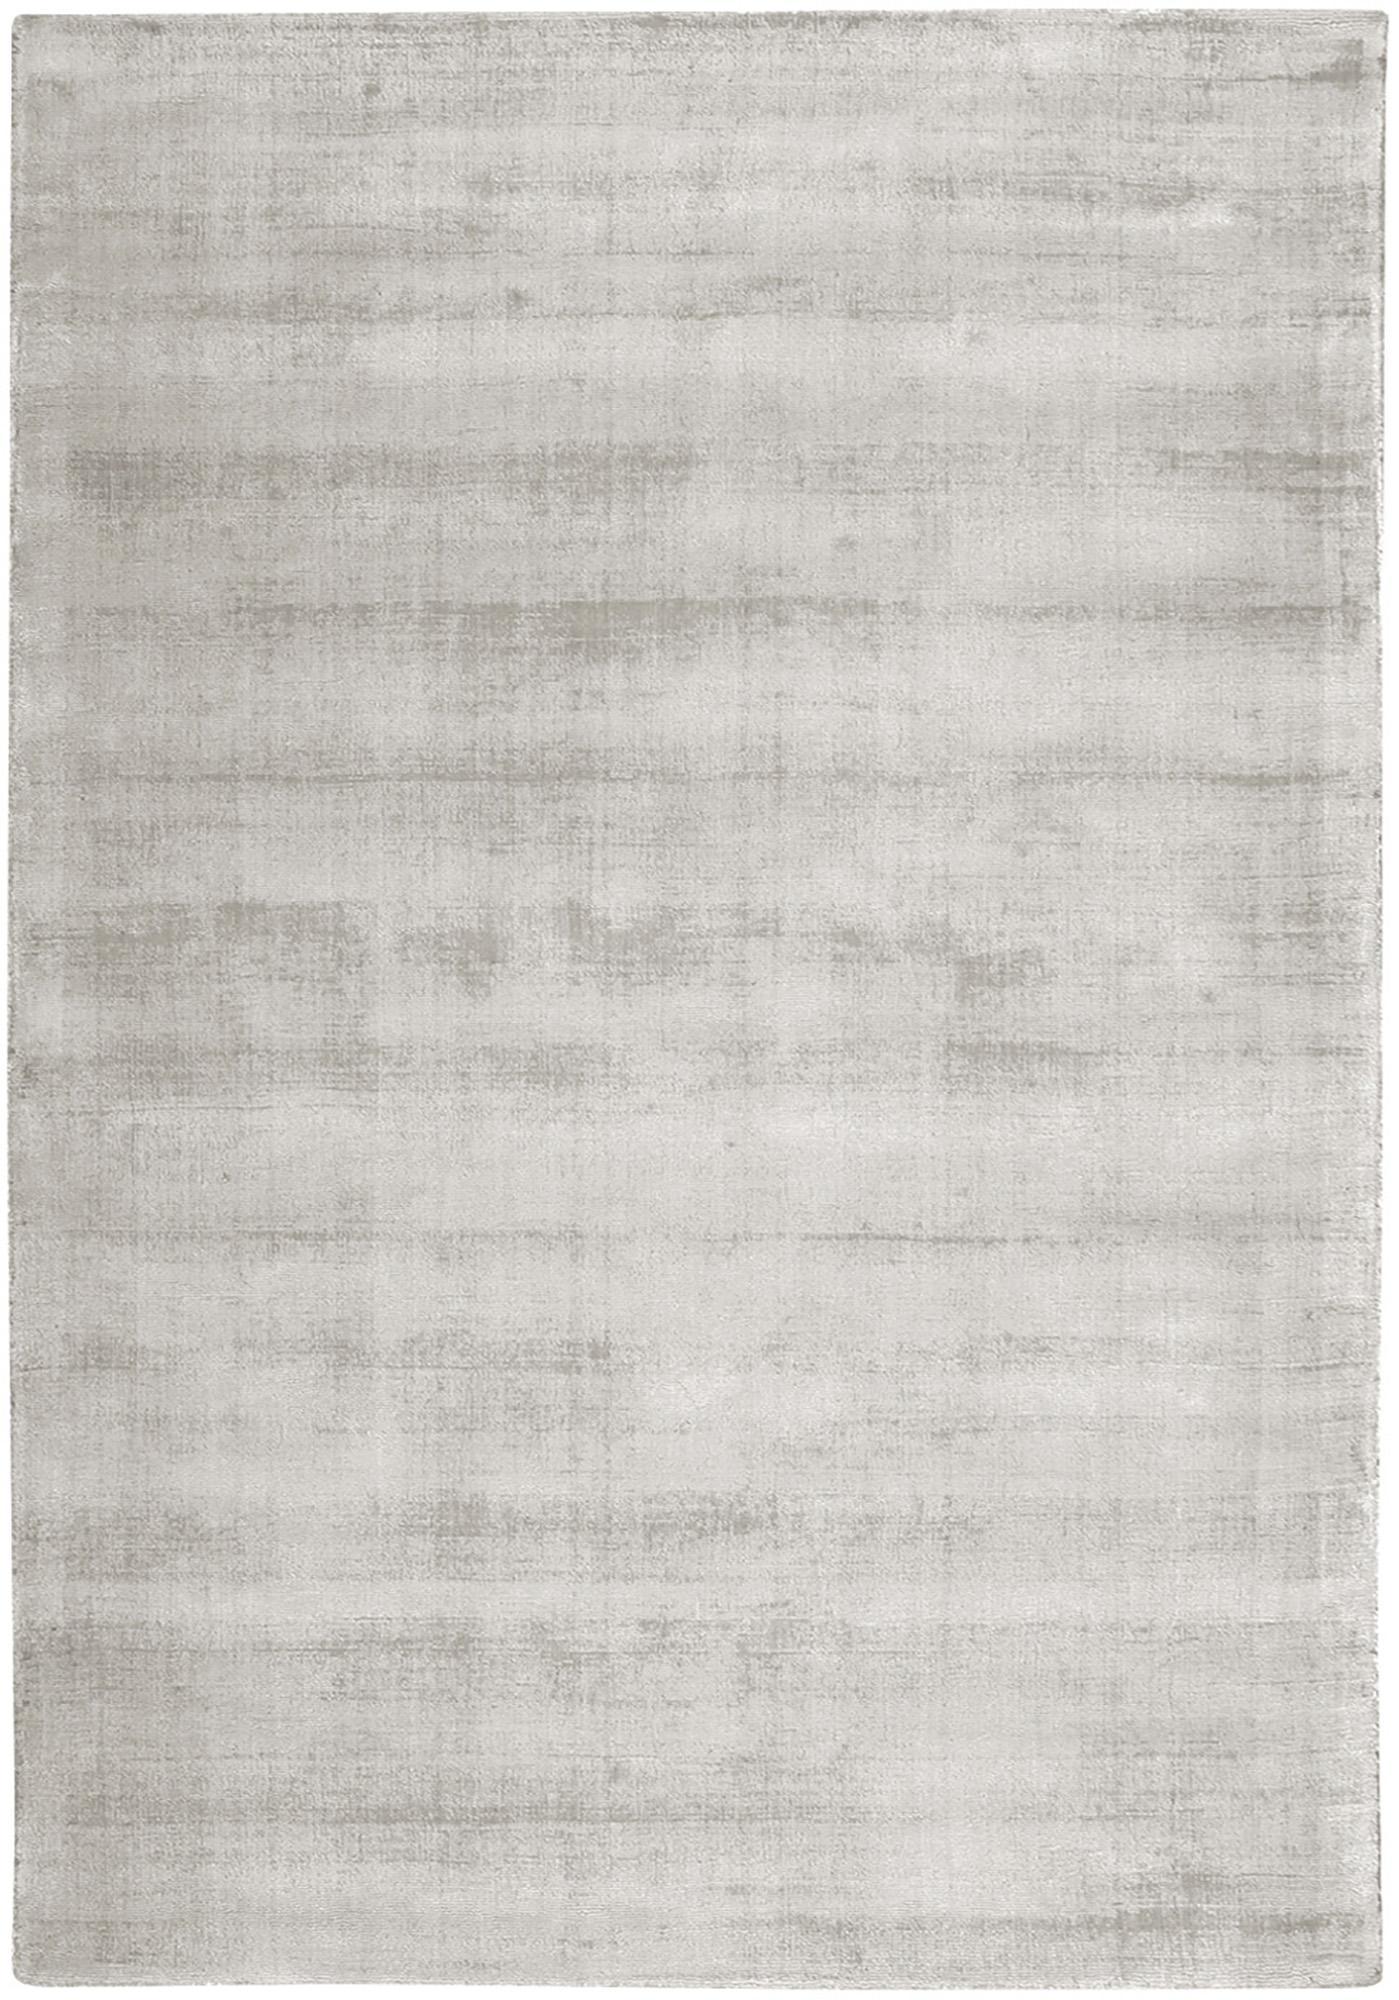 Alfombra artesanal de viscosa Jane, Parte superior: 100%viscosa, Reverso: 100%algodón, Gris claro, beige, An 160 x L 230 cm (Tamaño M)